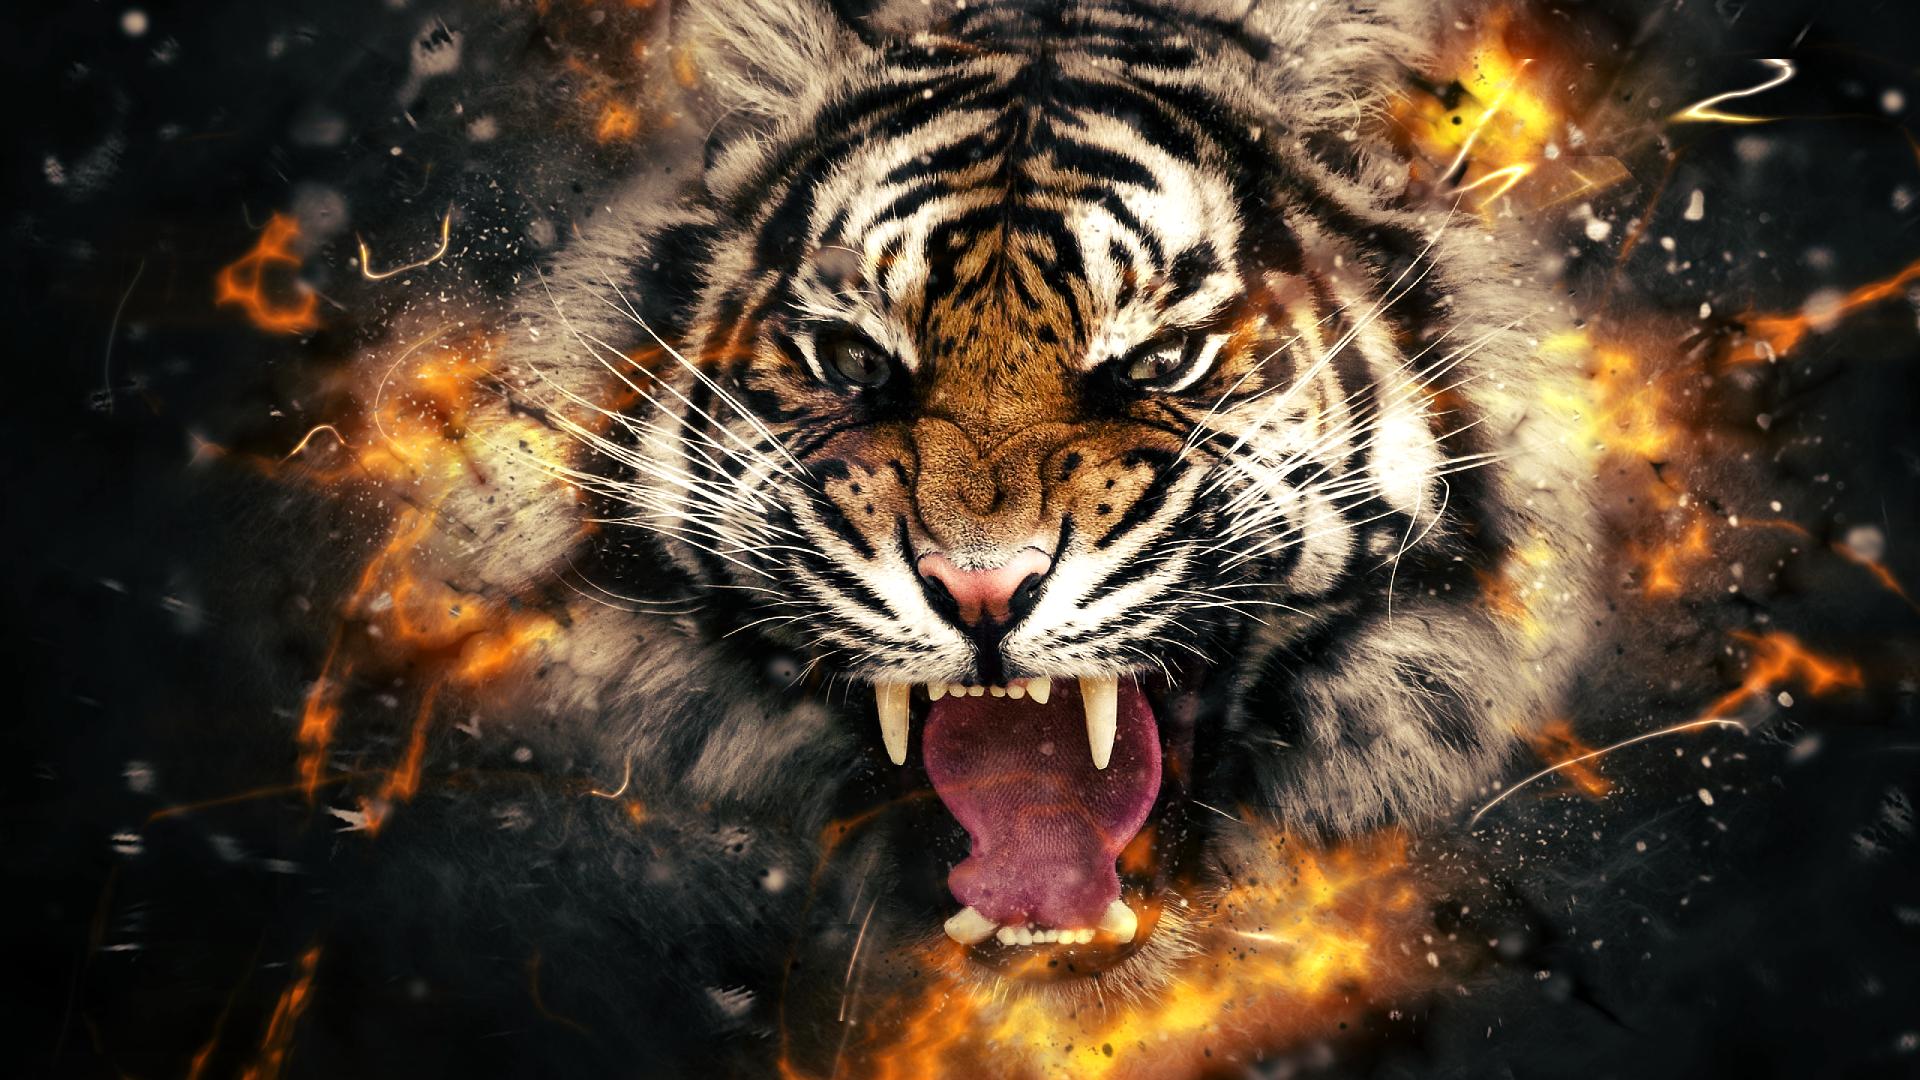 Troup High Tigers Troup Pinterest Animal wallpaper Bengal